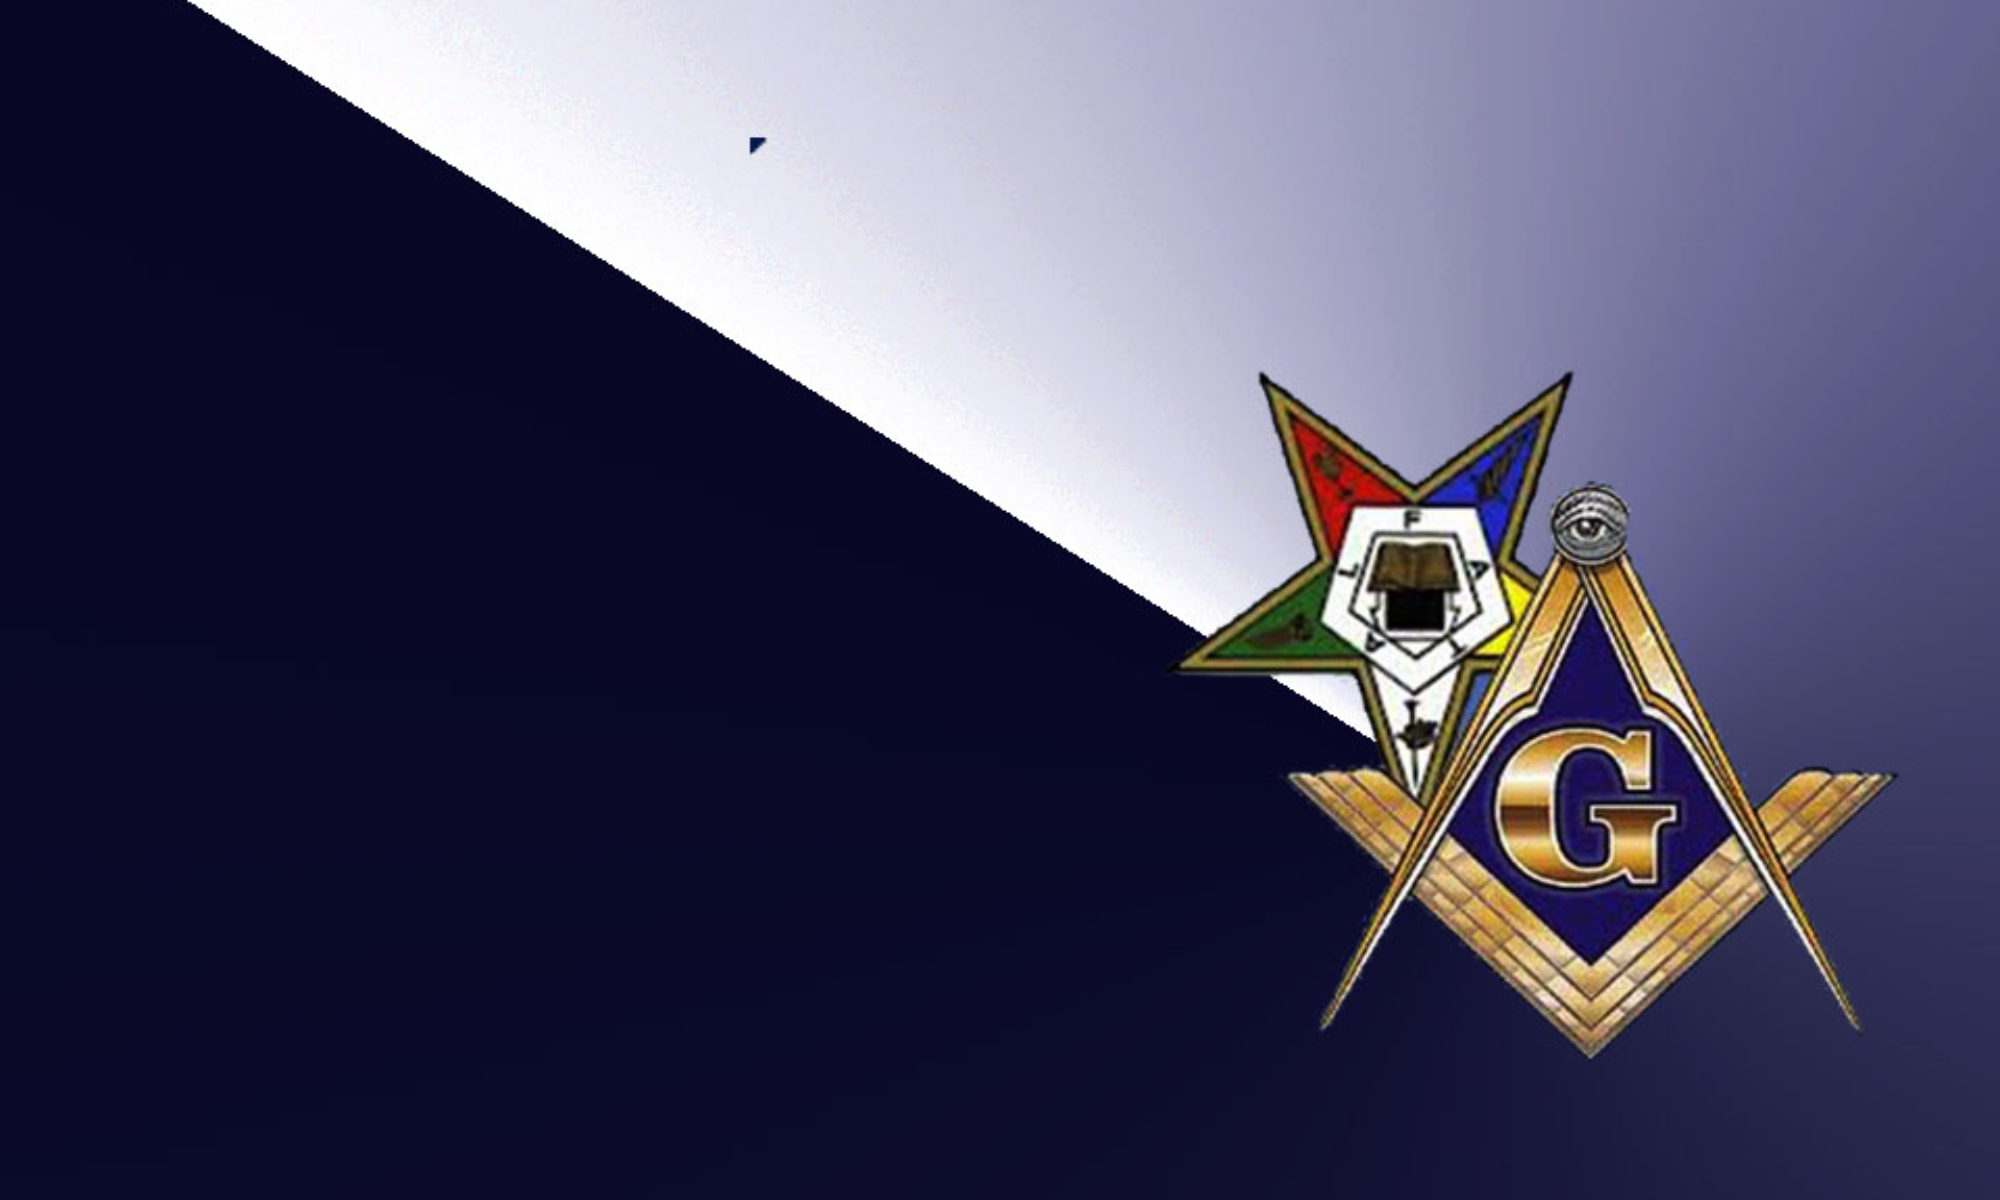 Most Worshipful Consolidated Hiram Grand Lodge of Virginia